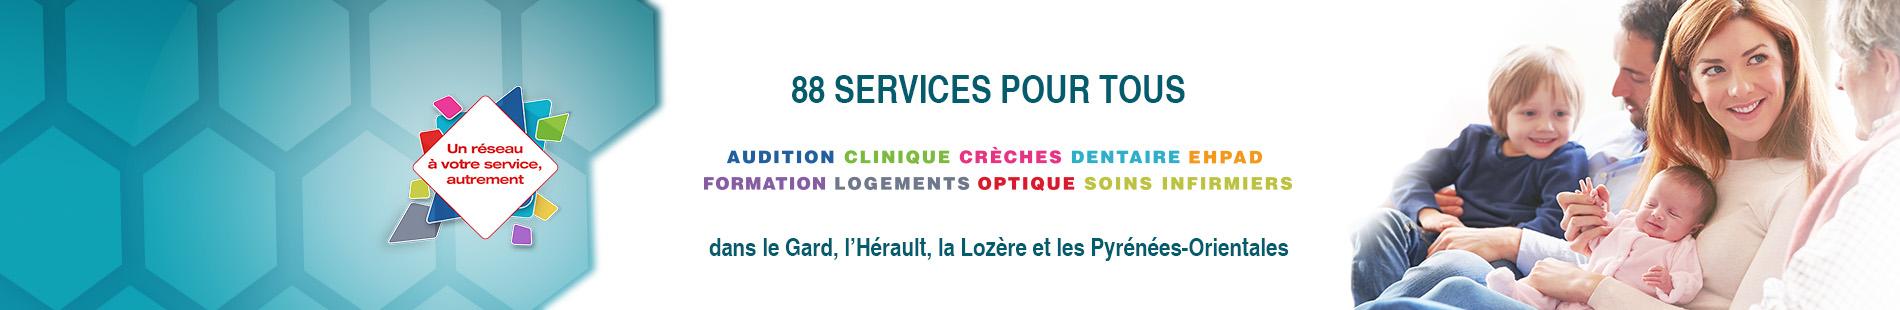 MFGS - 88 services